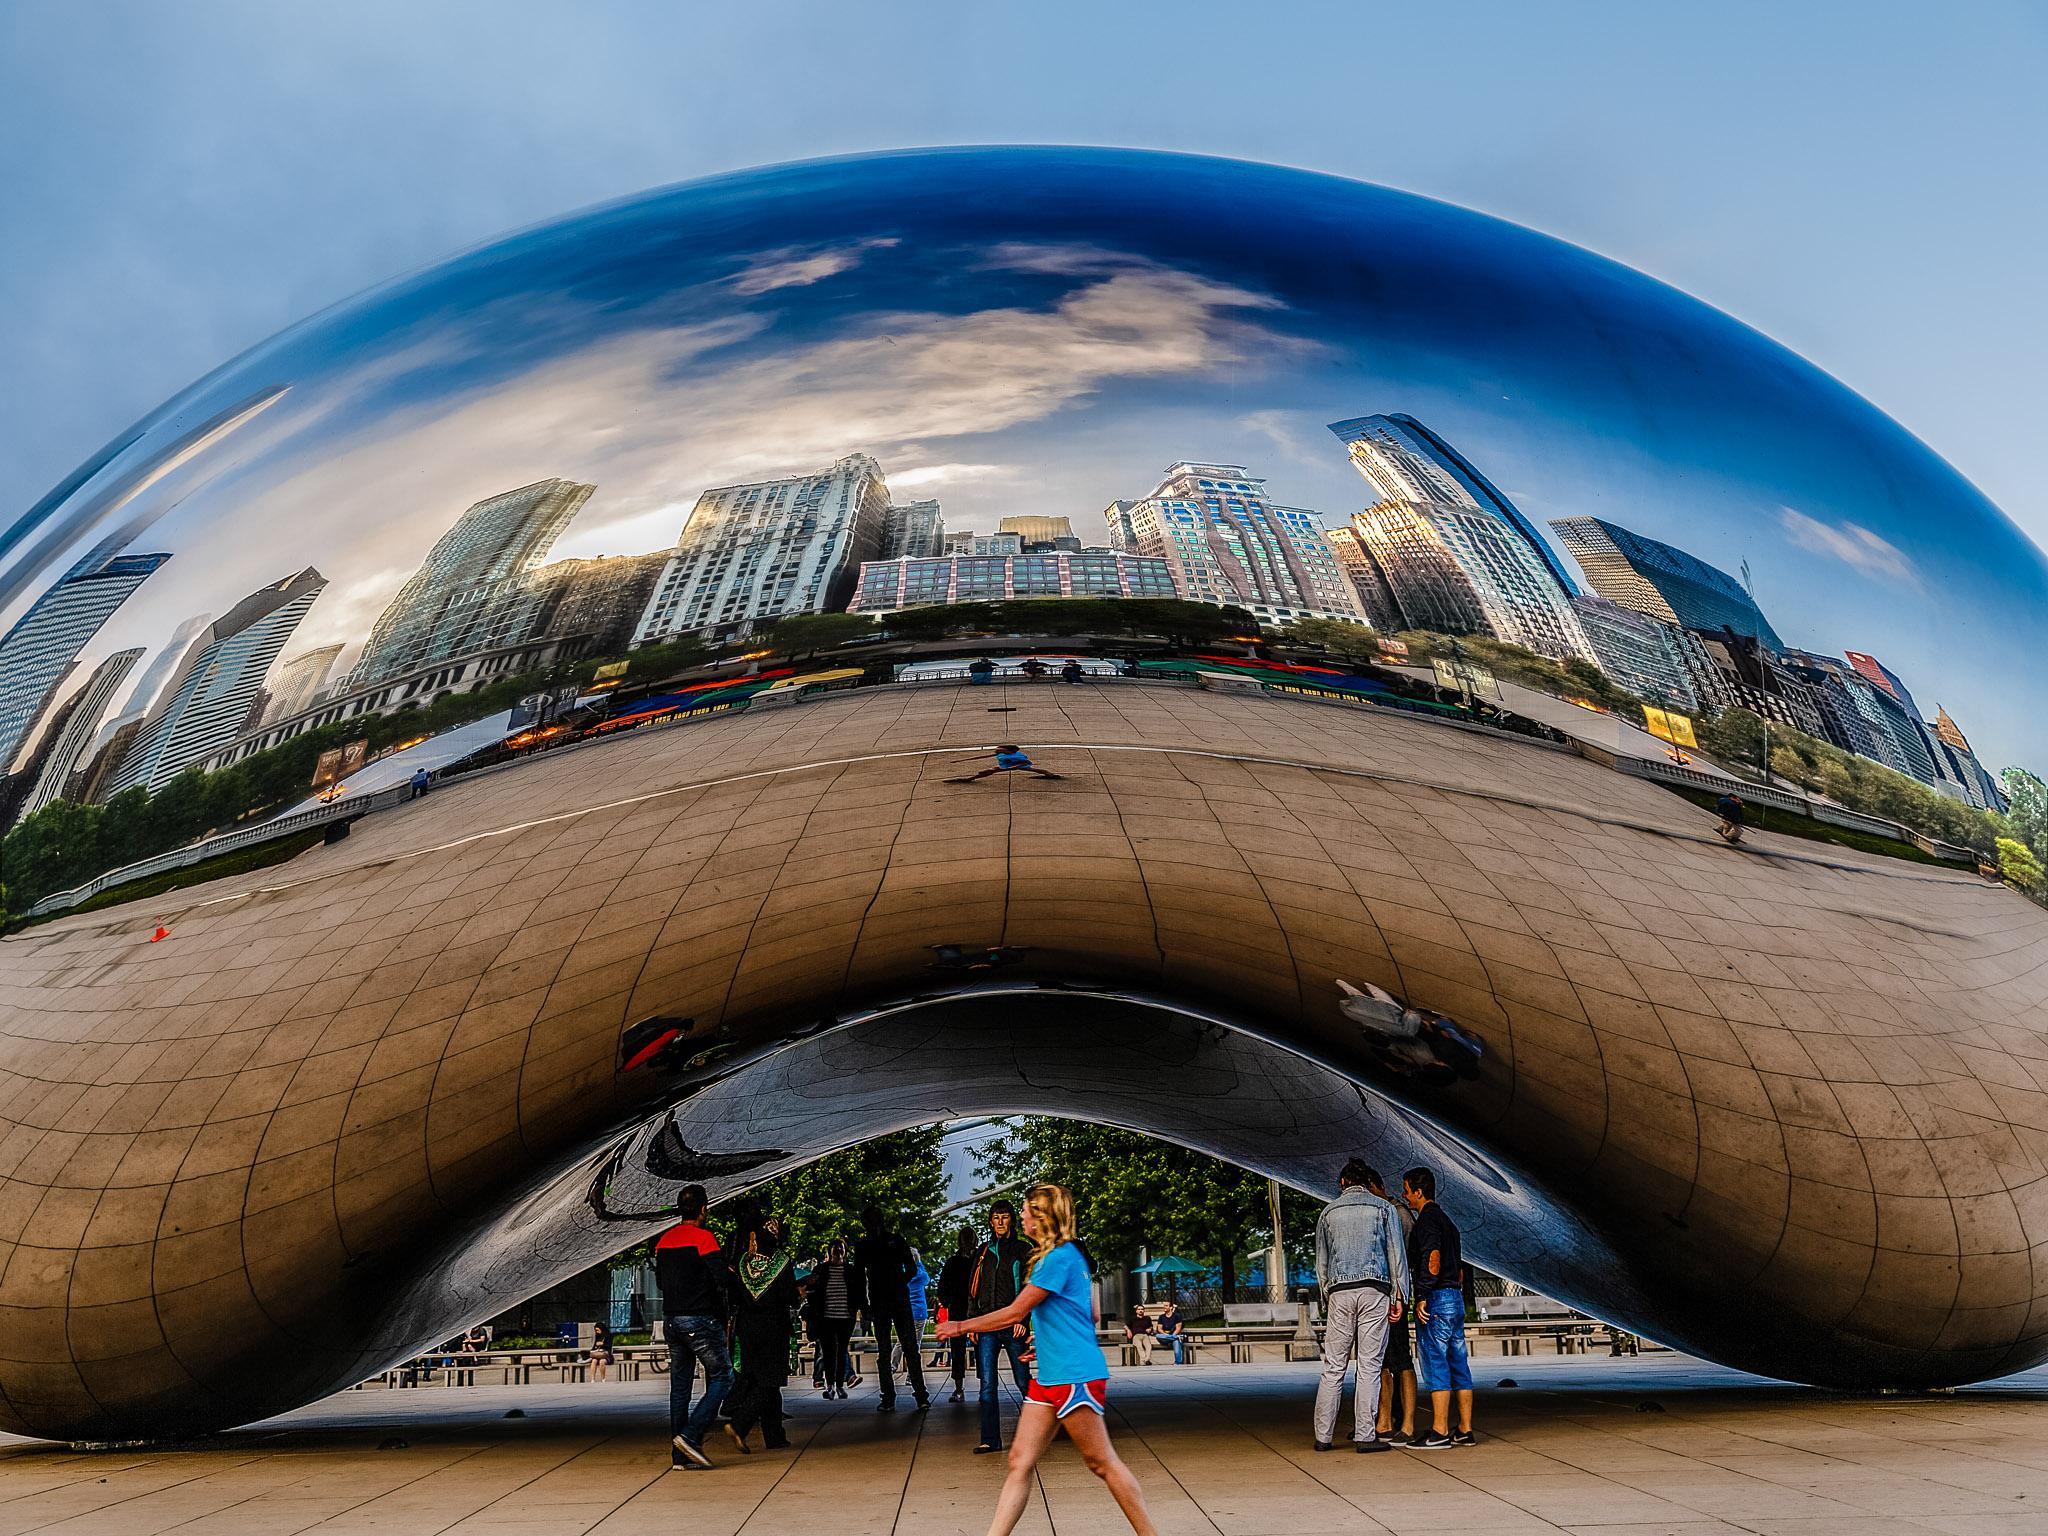 La Alubia de Anish Kapoor, Chicago